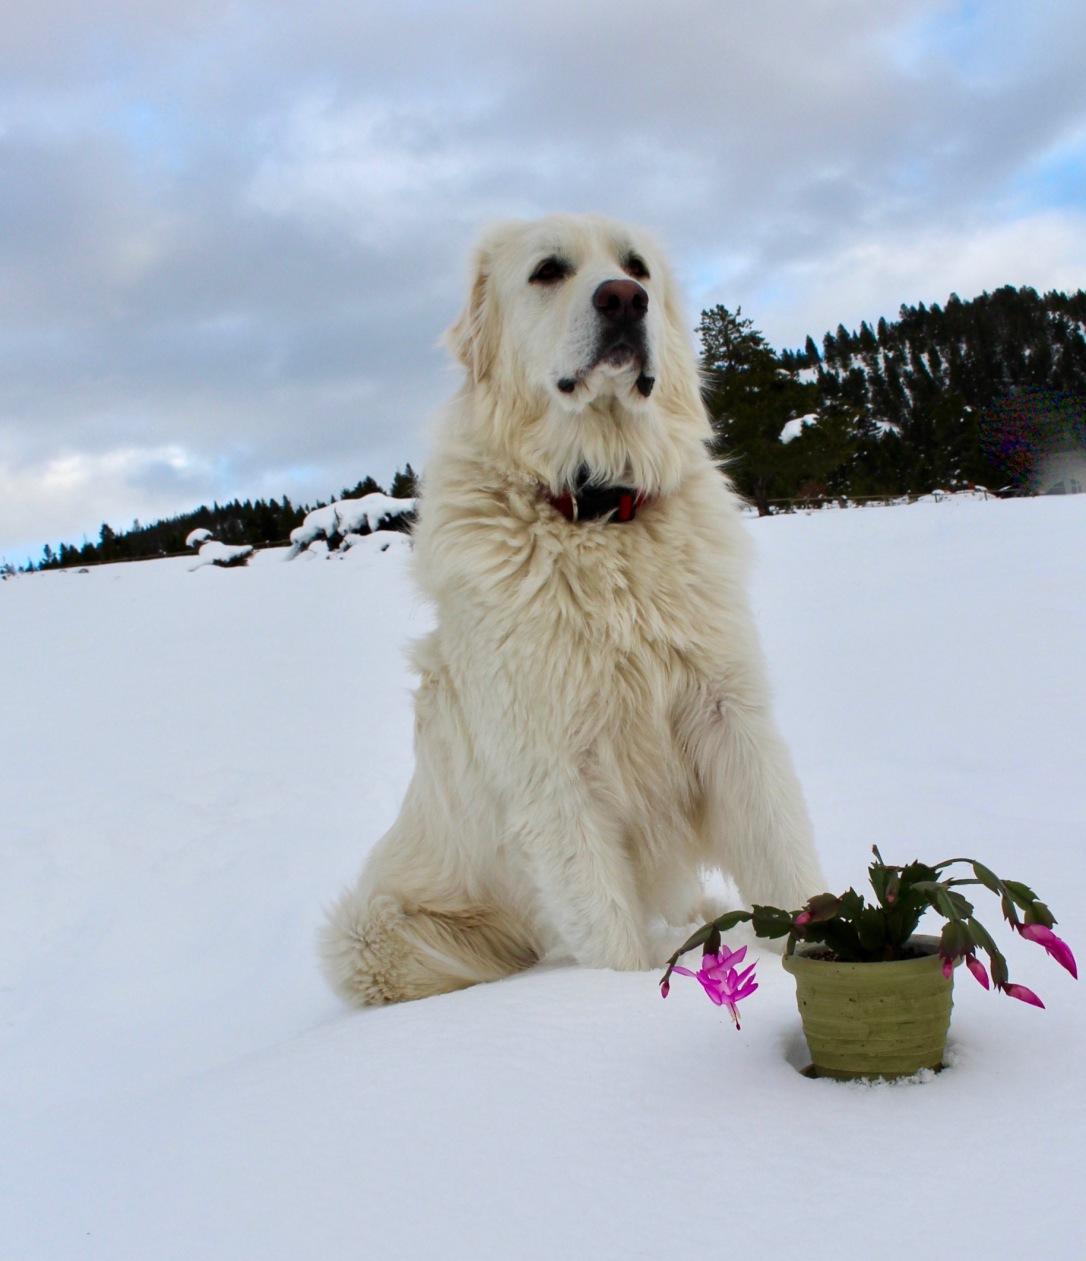 Stoic Arthur in the snow